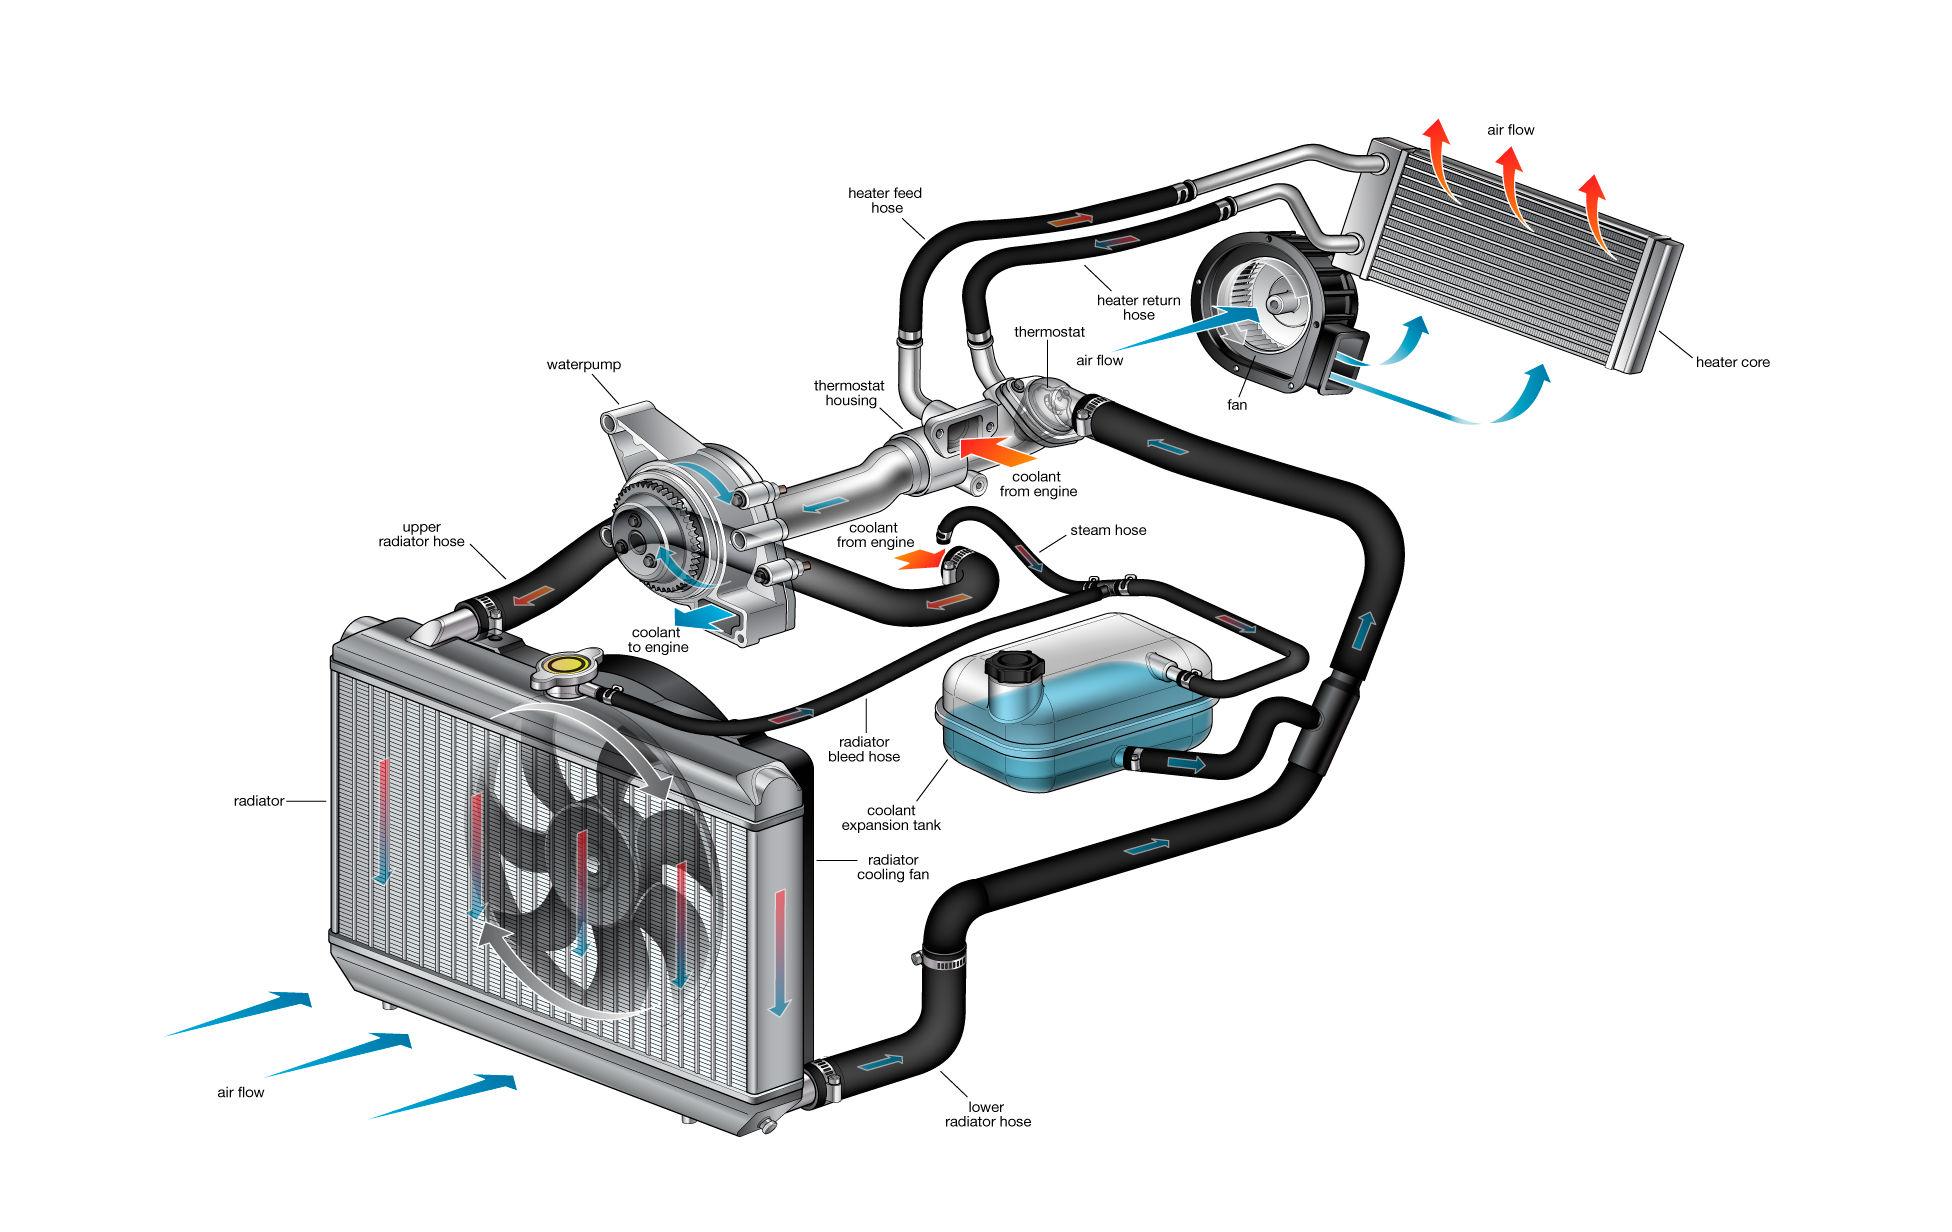 automotive hvac diagram 99 jeep grand cherokee laredo radio wiring cooling system repair autospot auto centerville